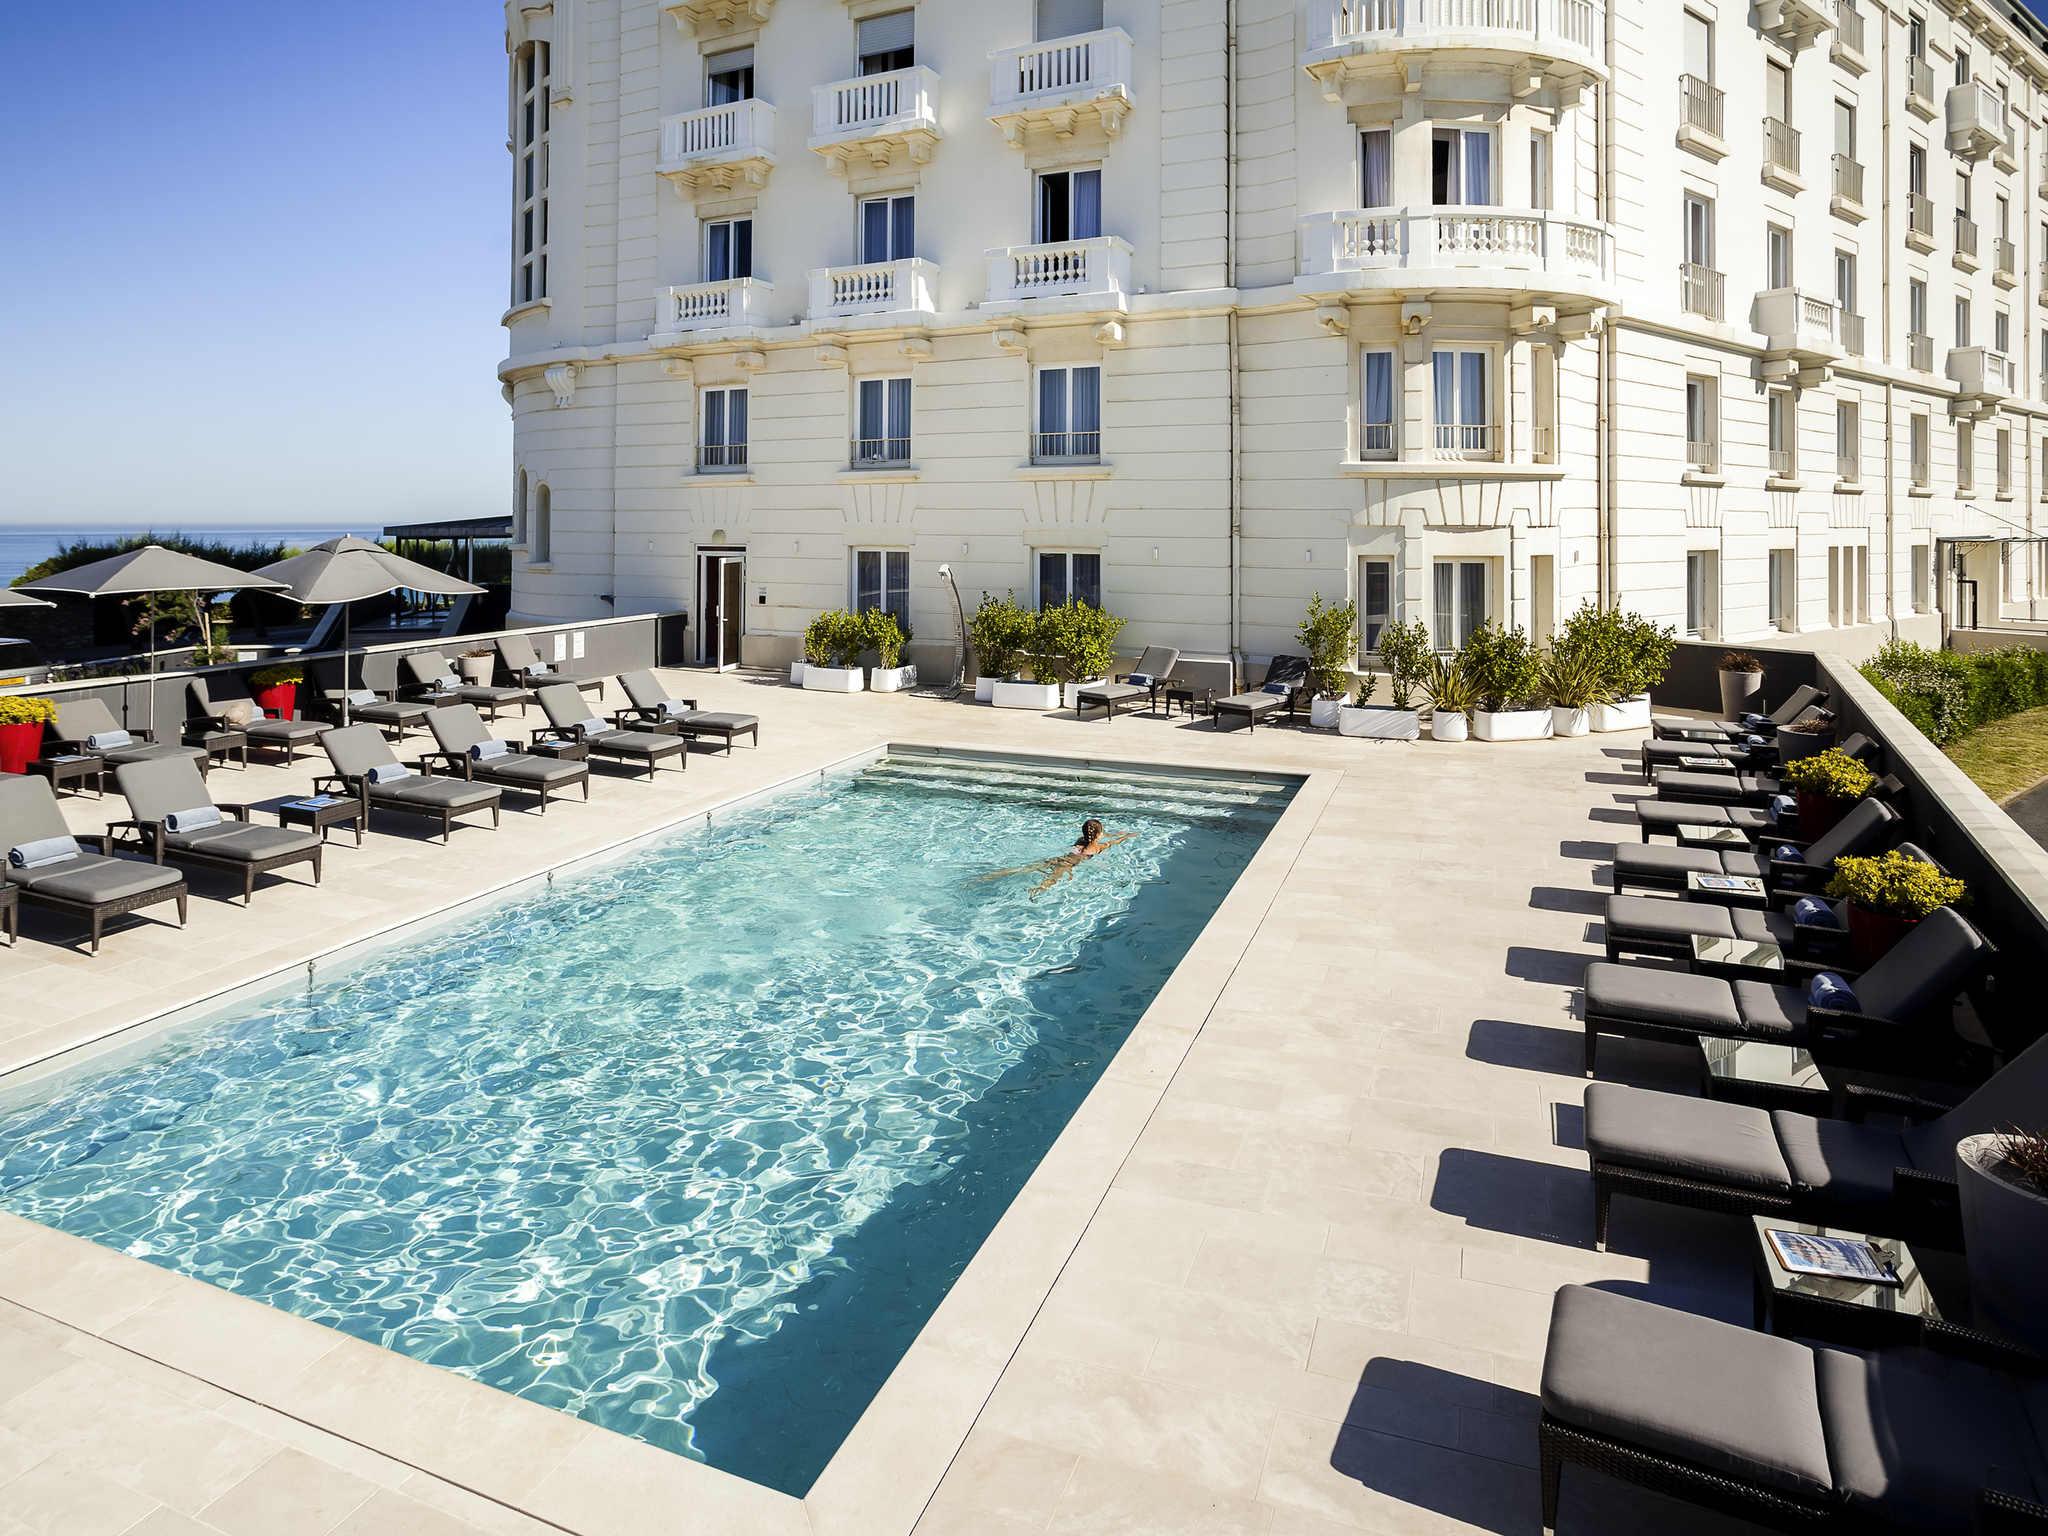 Otel – Le Régina Biarritz Hôtel & Spa - MGallery by Sofitel